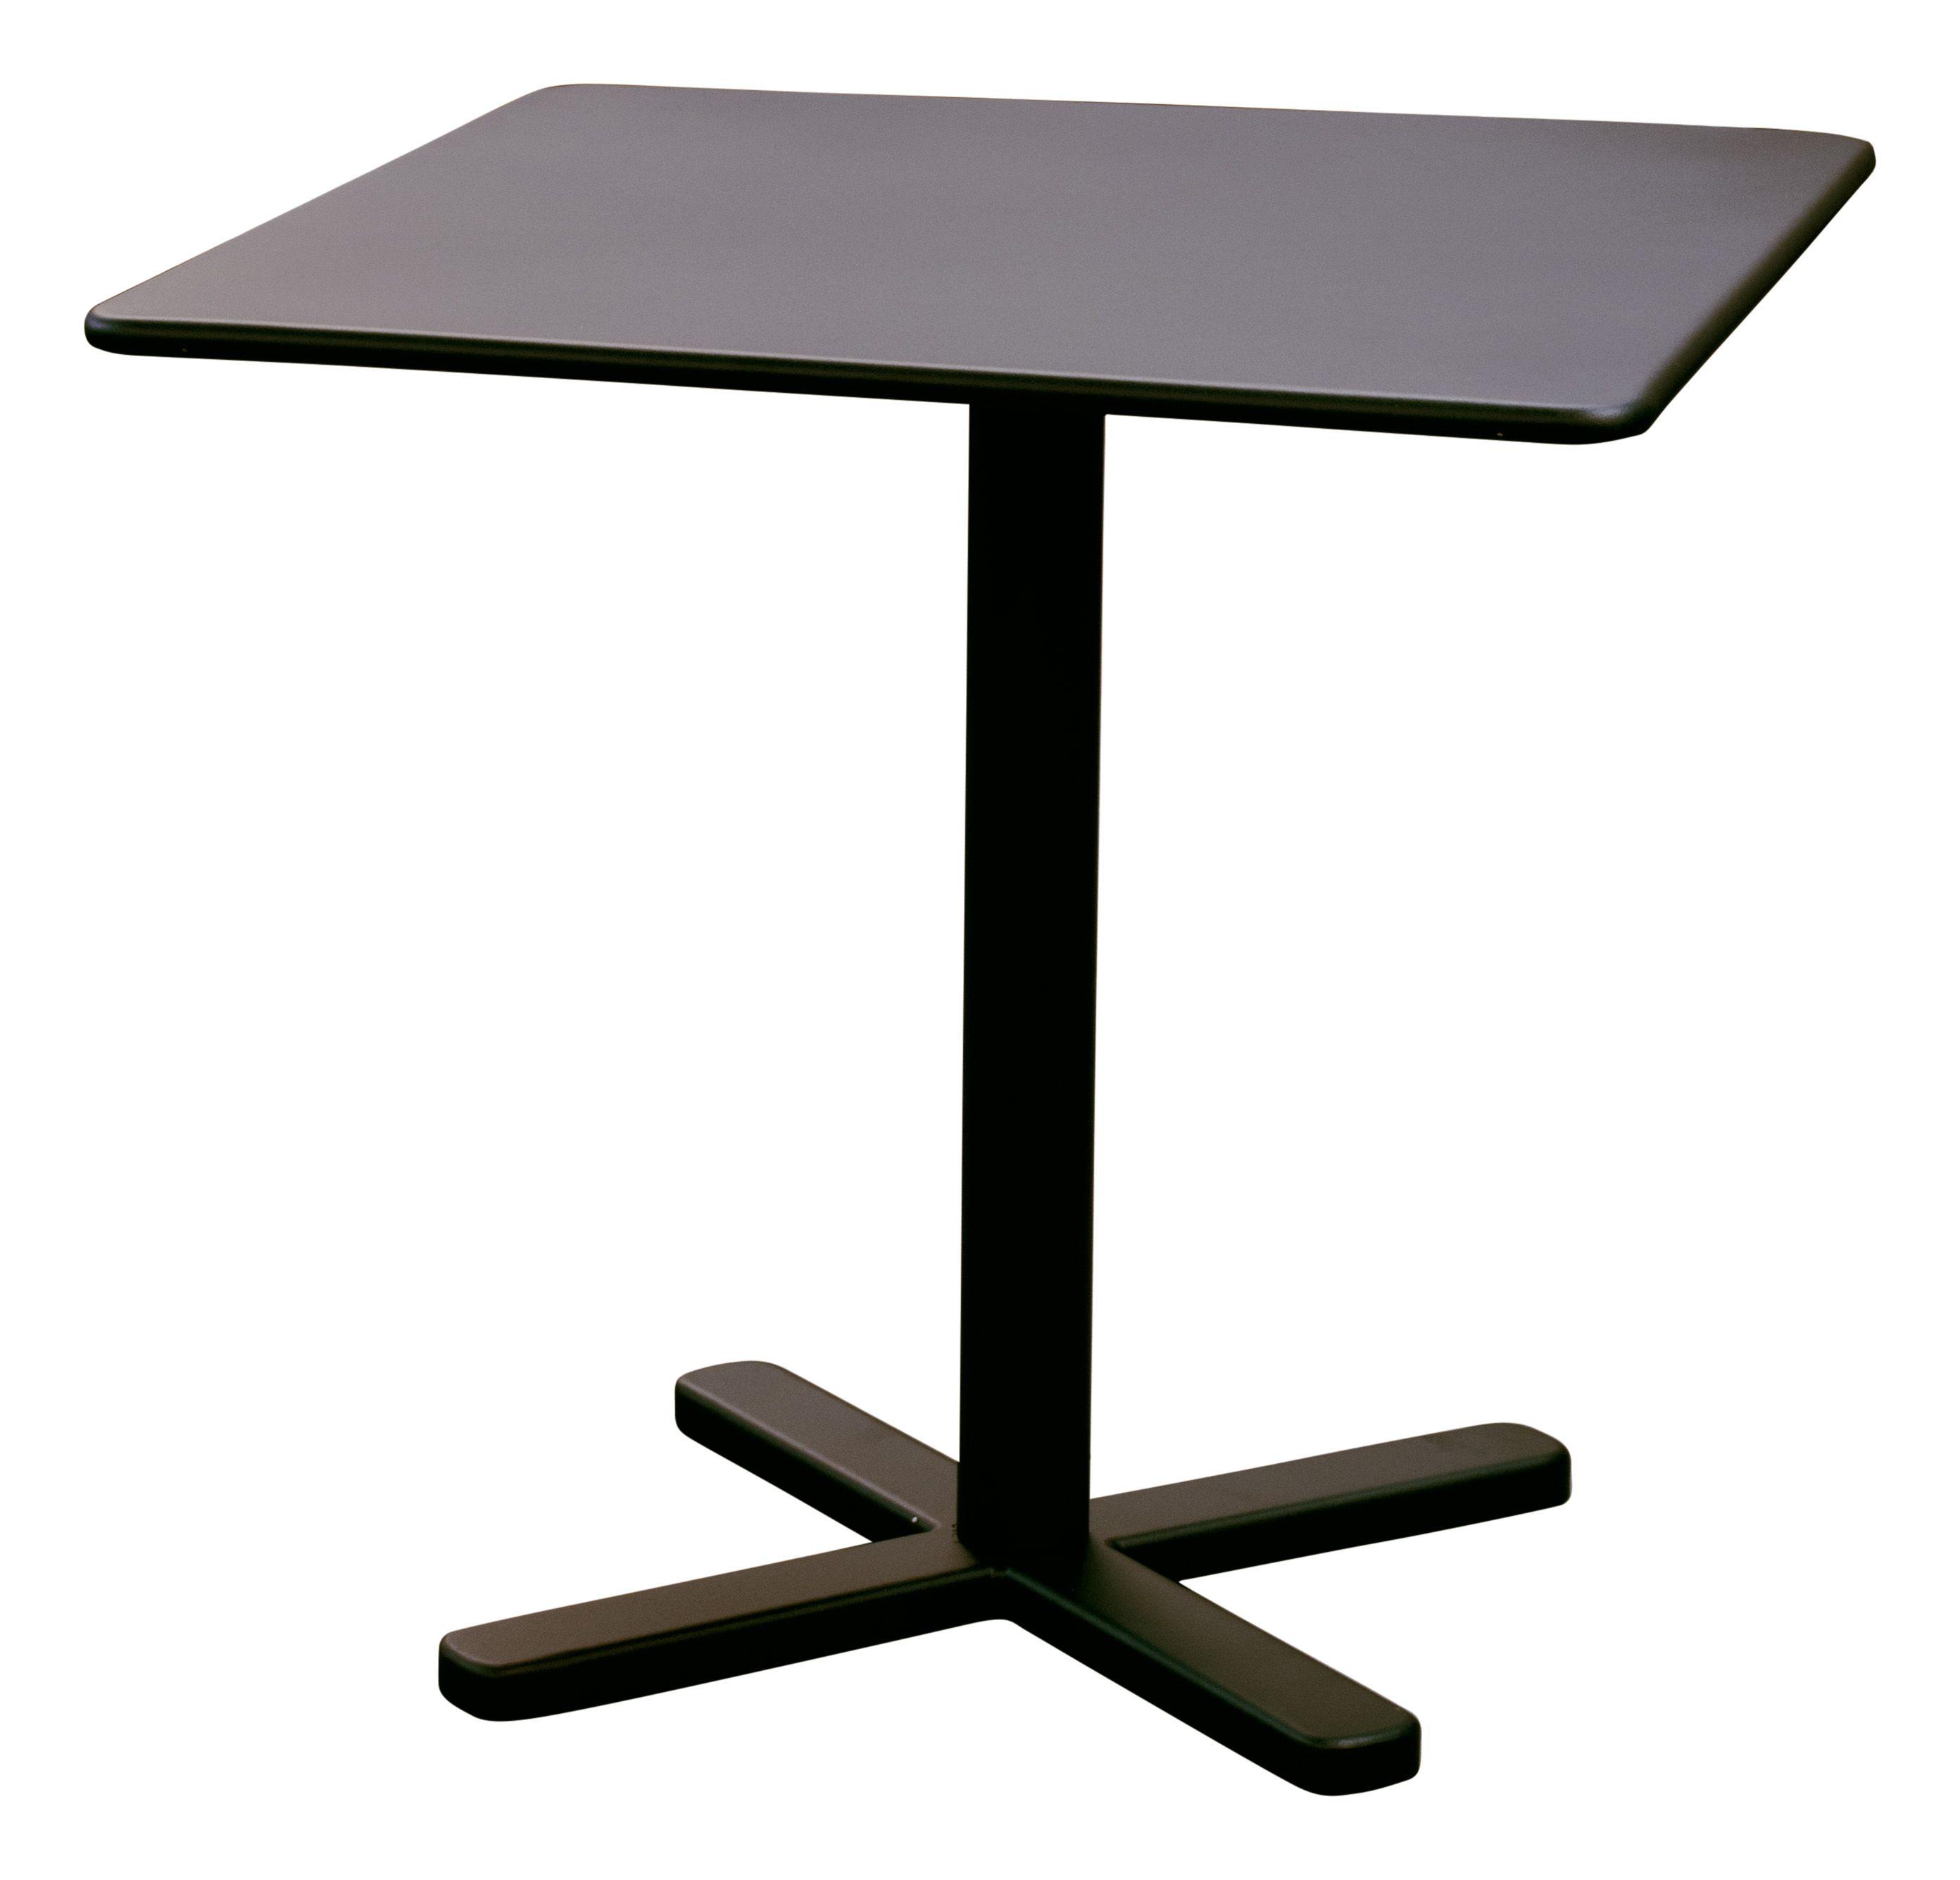 quadratischer tisch aus stahl kollektion darwin by emu group design lucidipevere. Black Bedroom Furniture Sets. Home Design Ideas